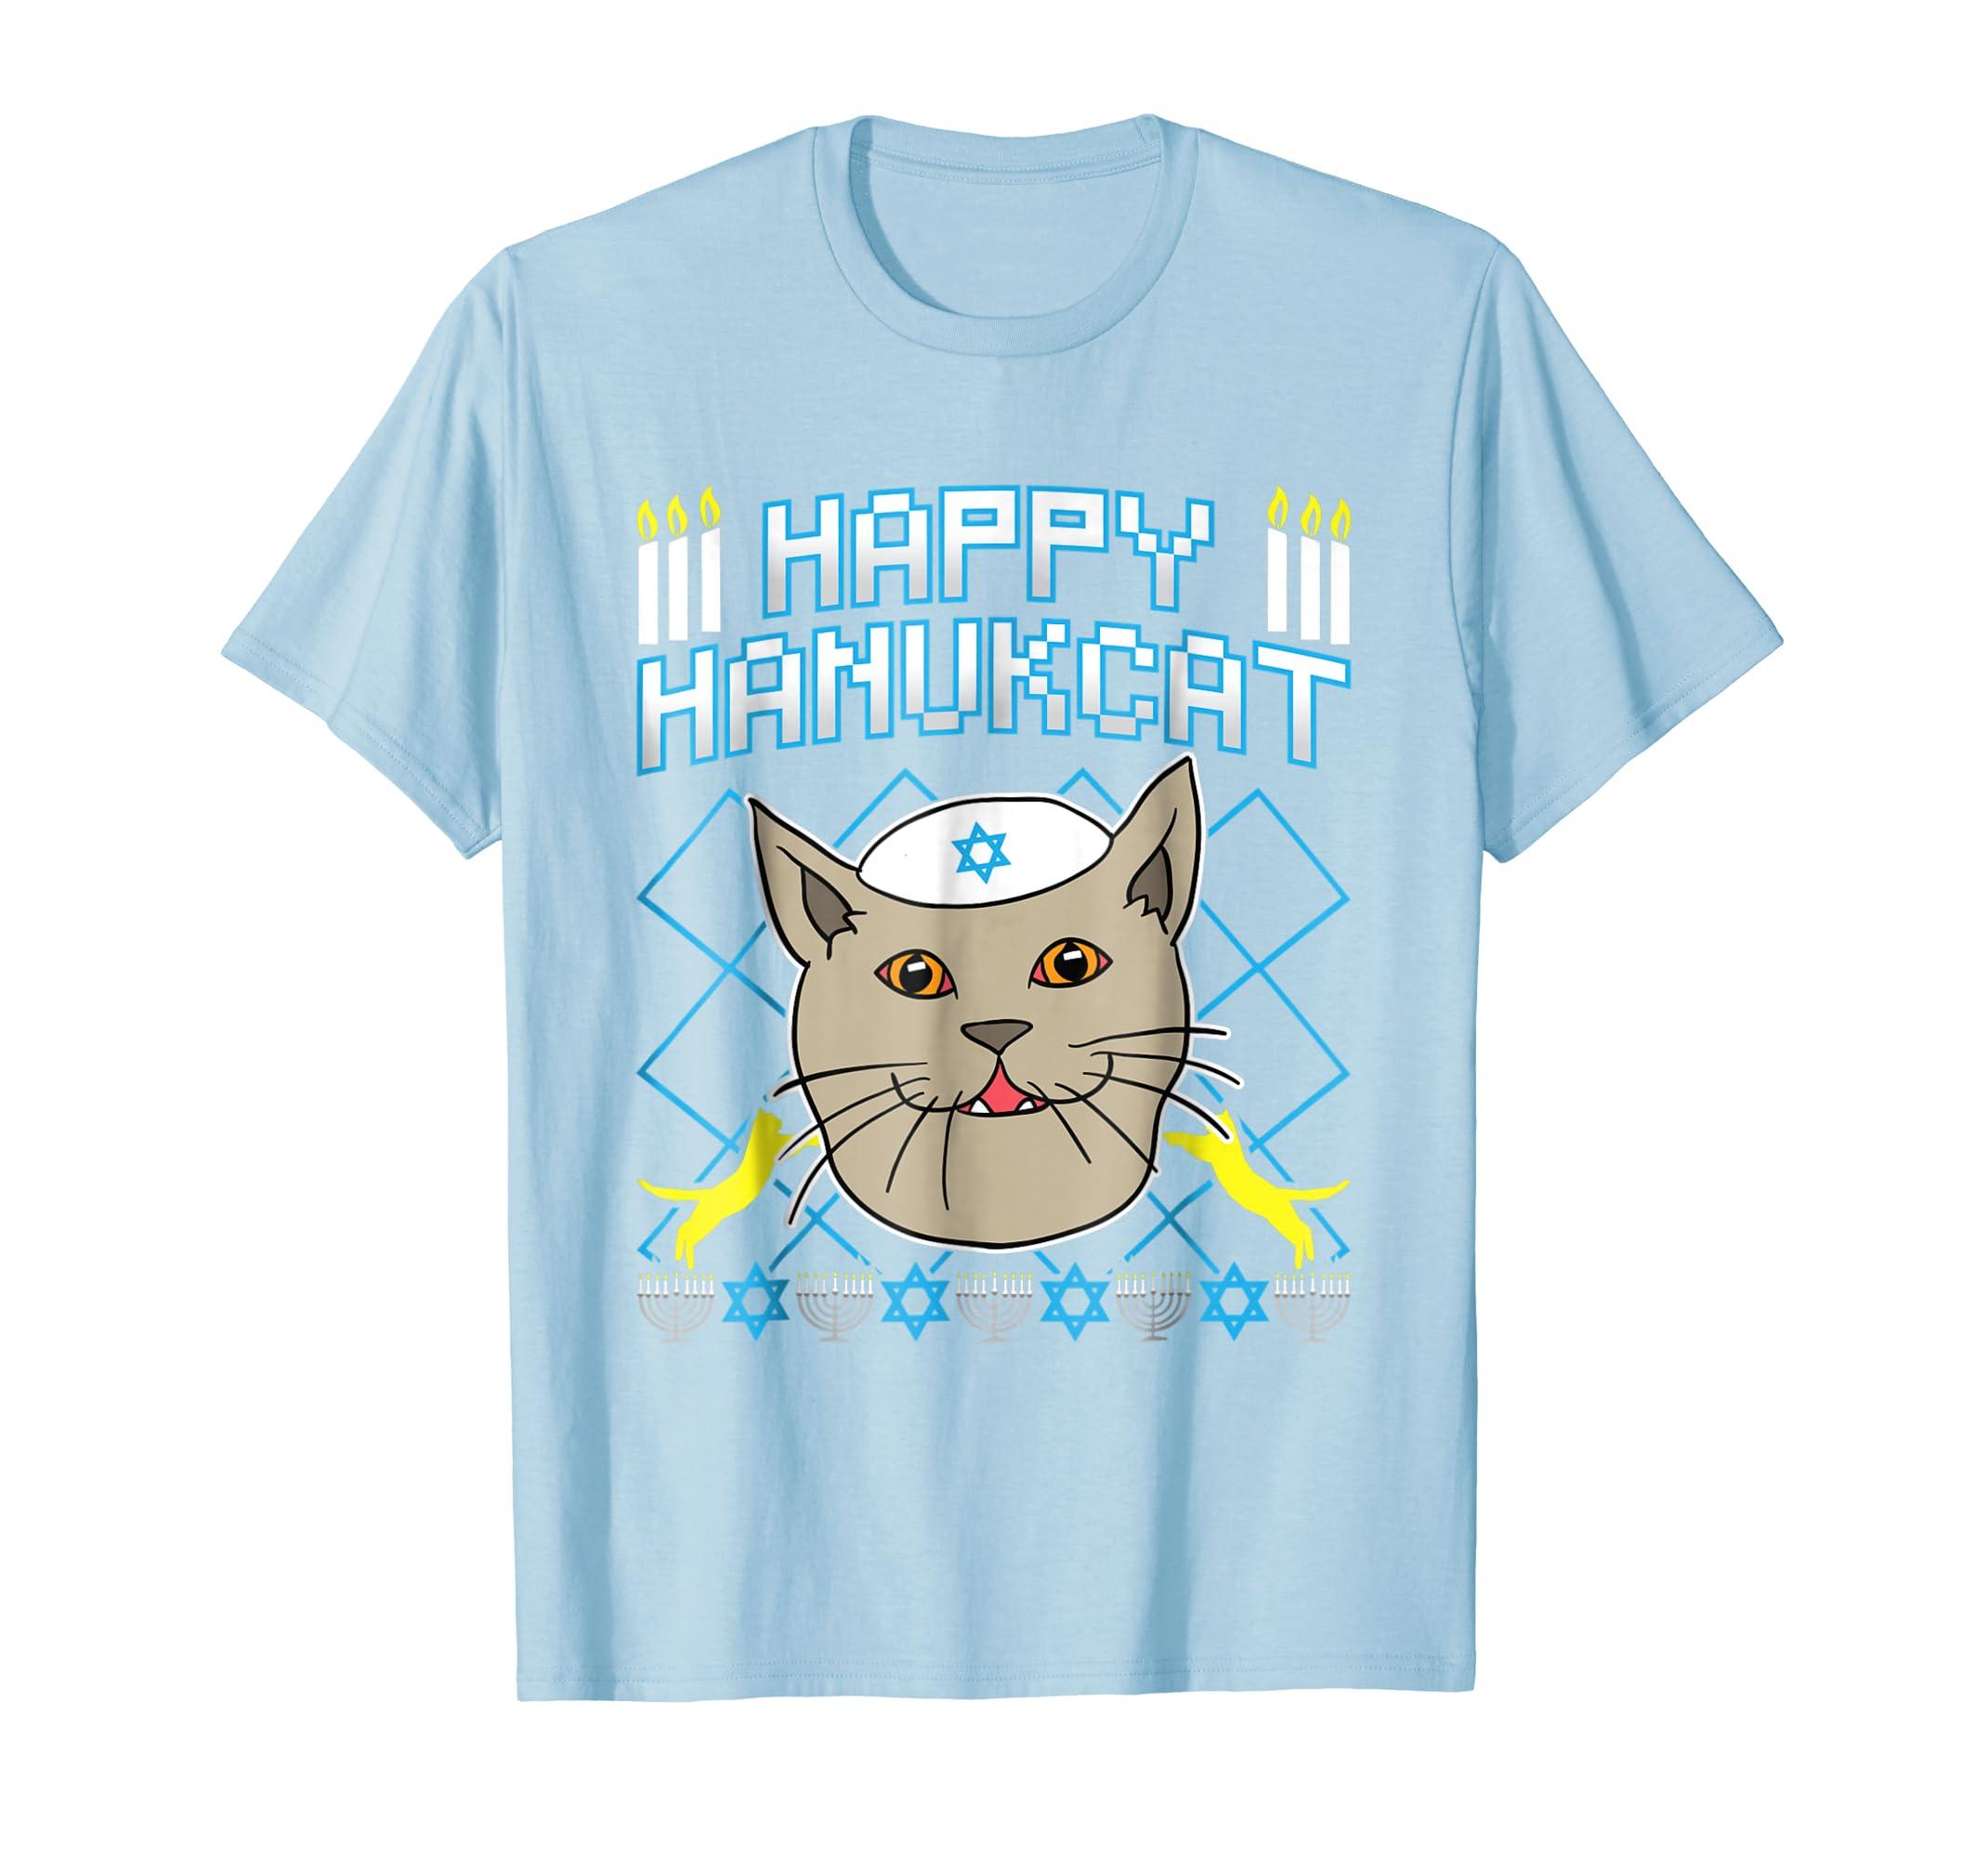 Jewish Christmas Sweater.Happy Hanukcat T Shirt Jewish Cat Ugly Christmas Sweater Tee Teechatpro